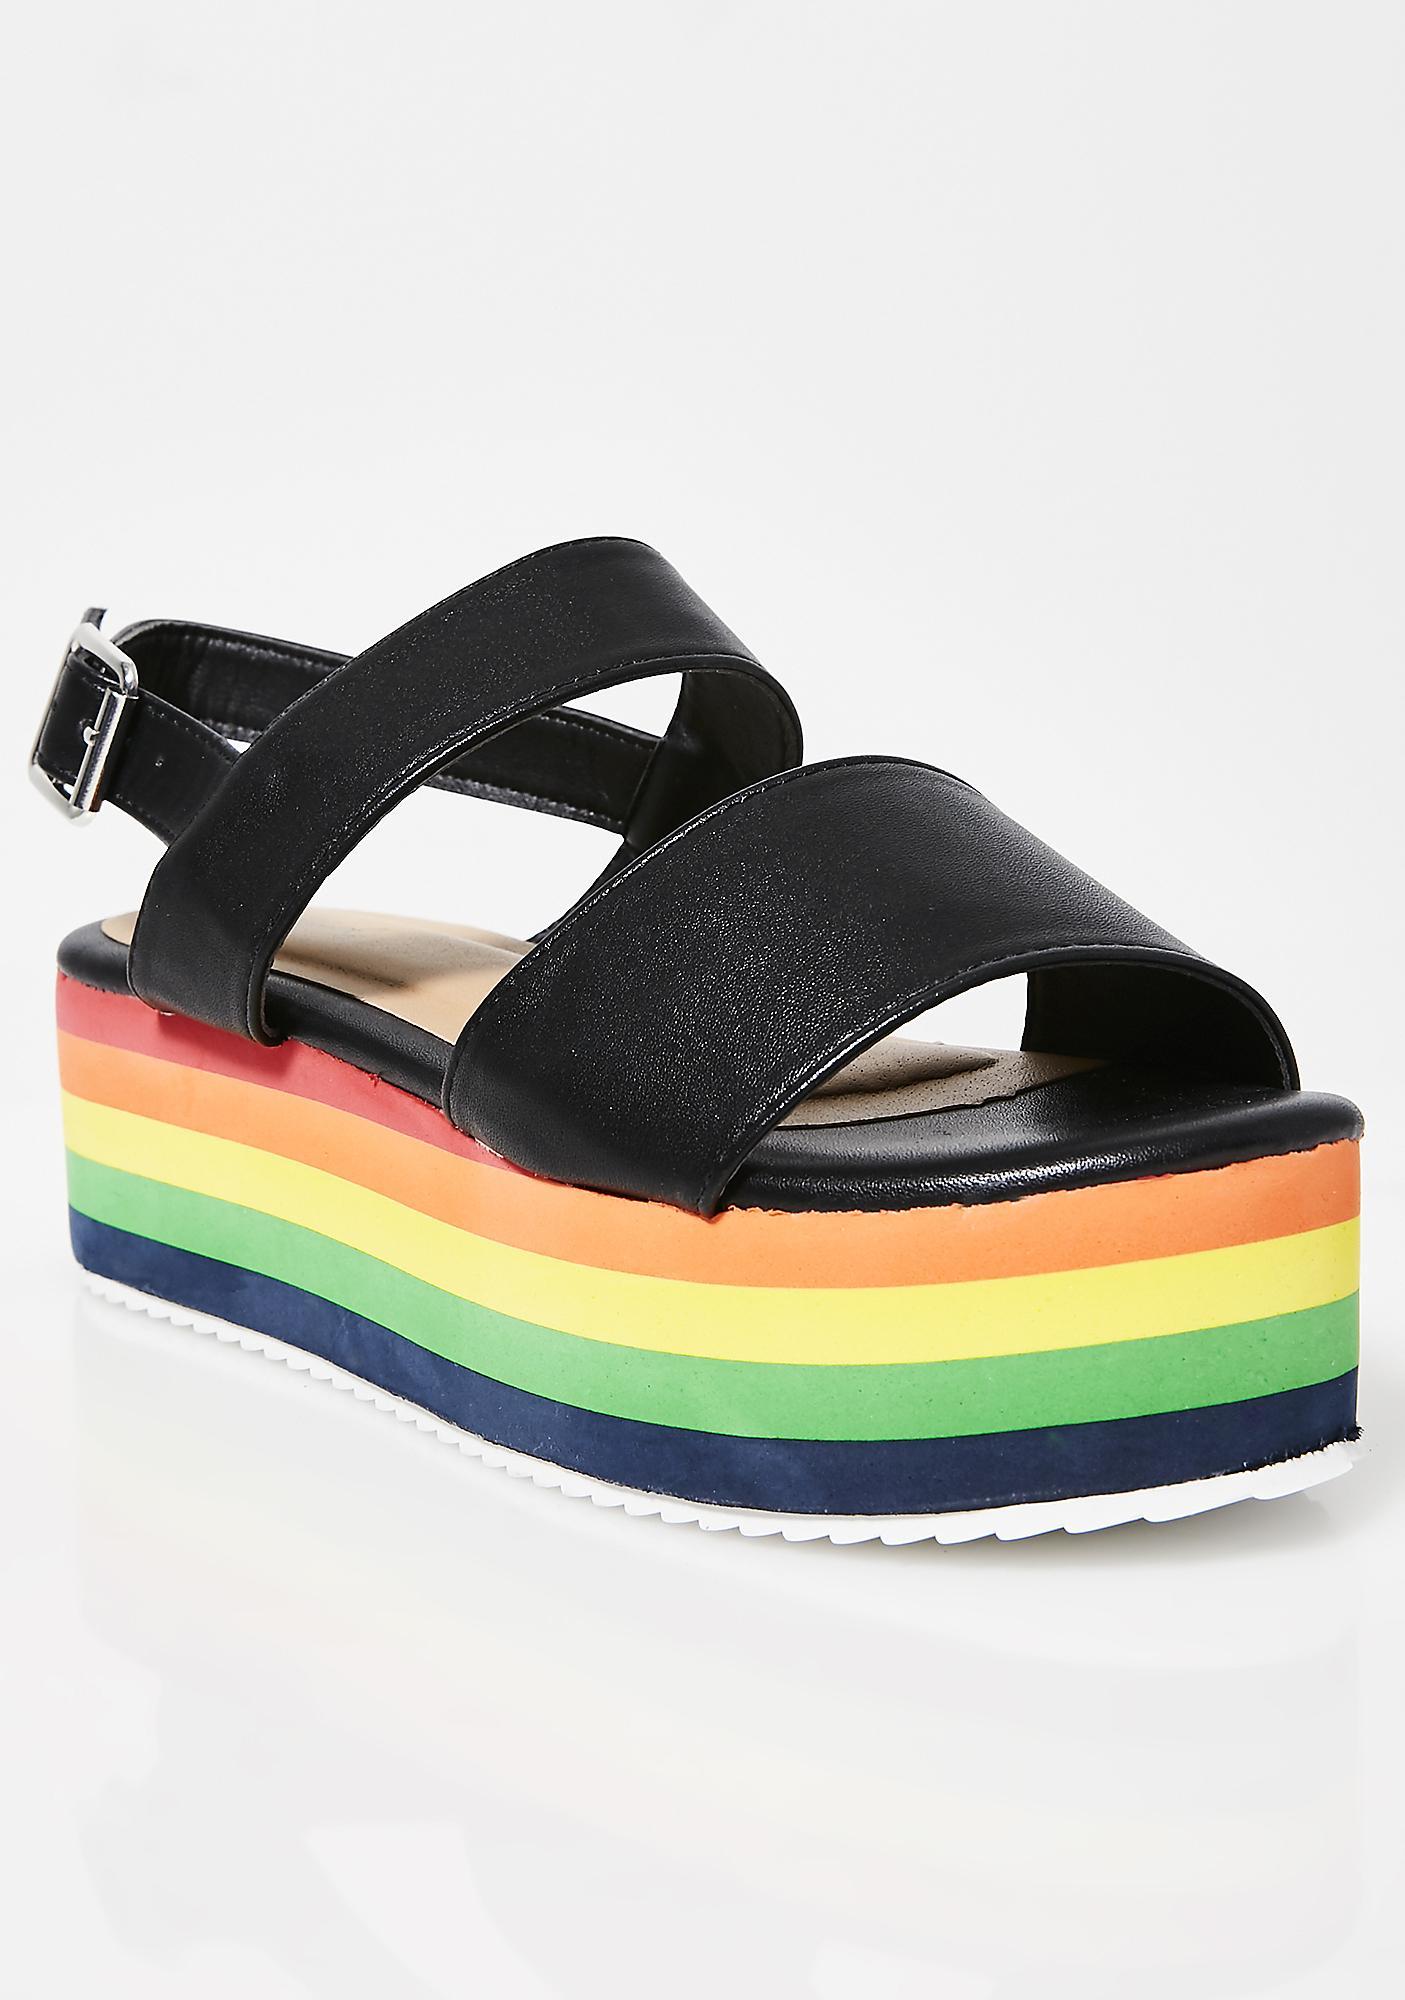 Bright Sunshine Platform Sandals